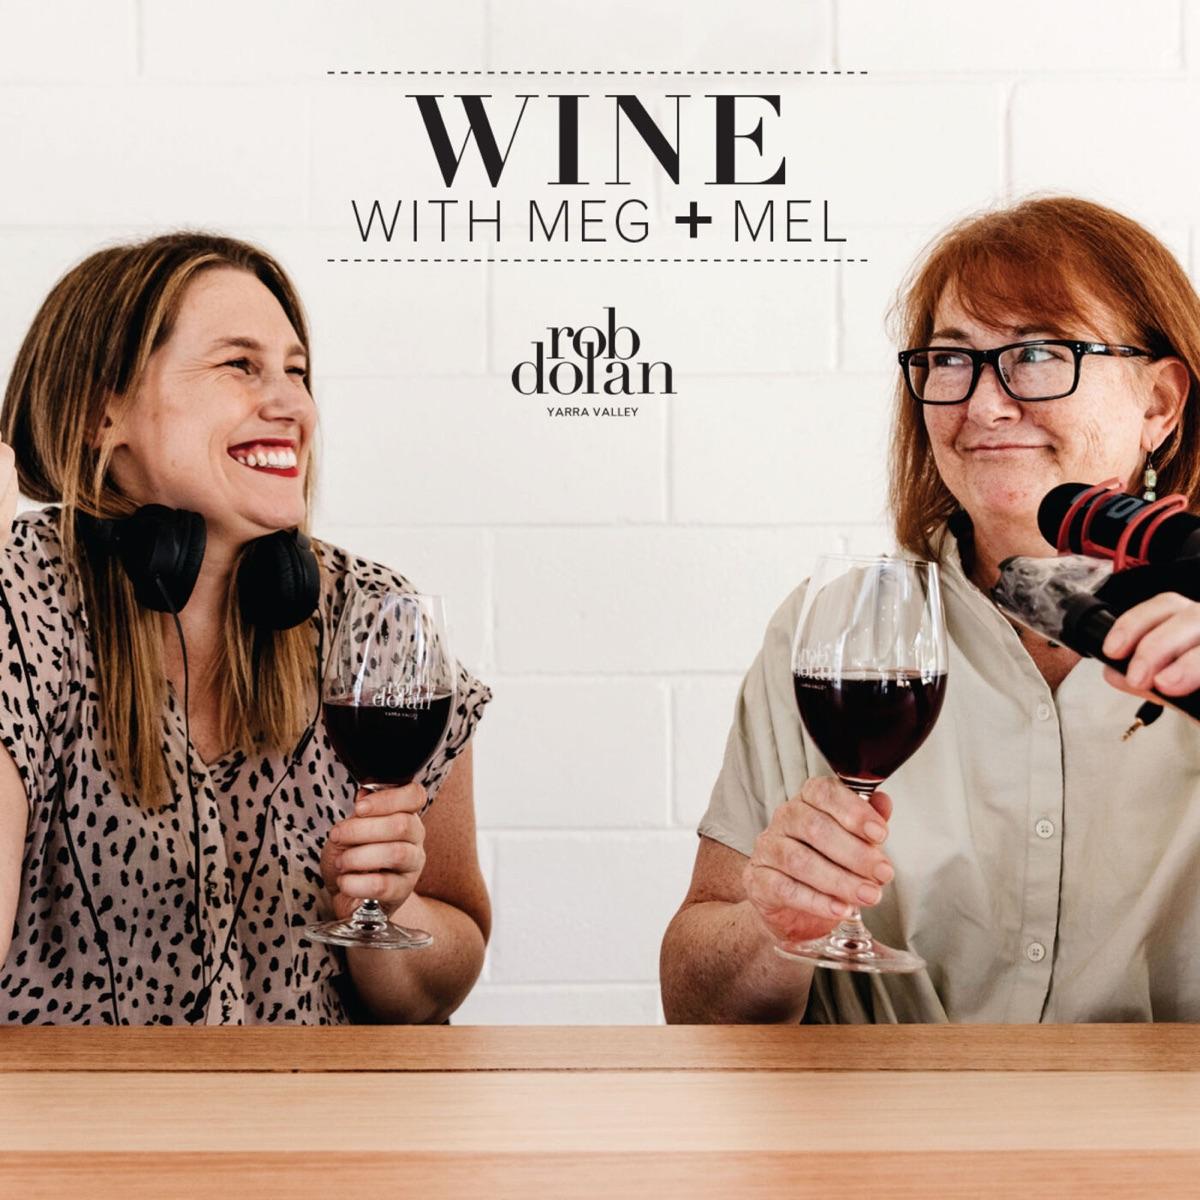 Wine with Meg + Mel